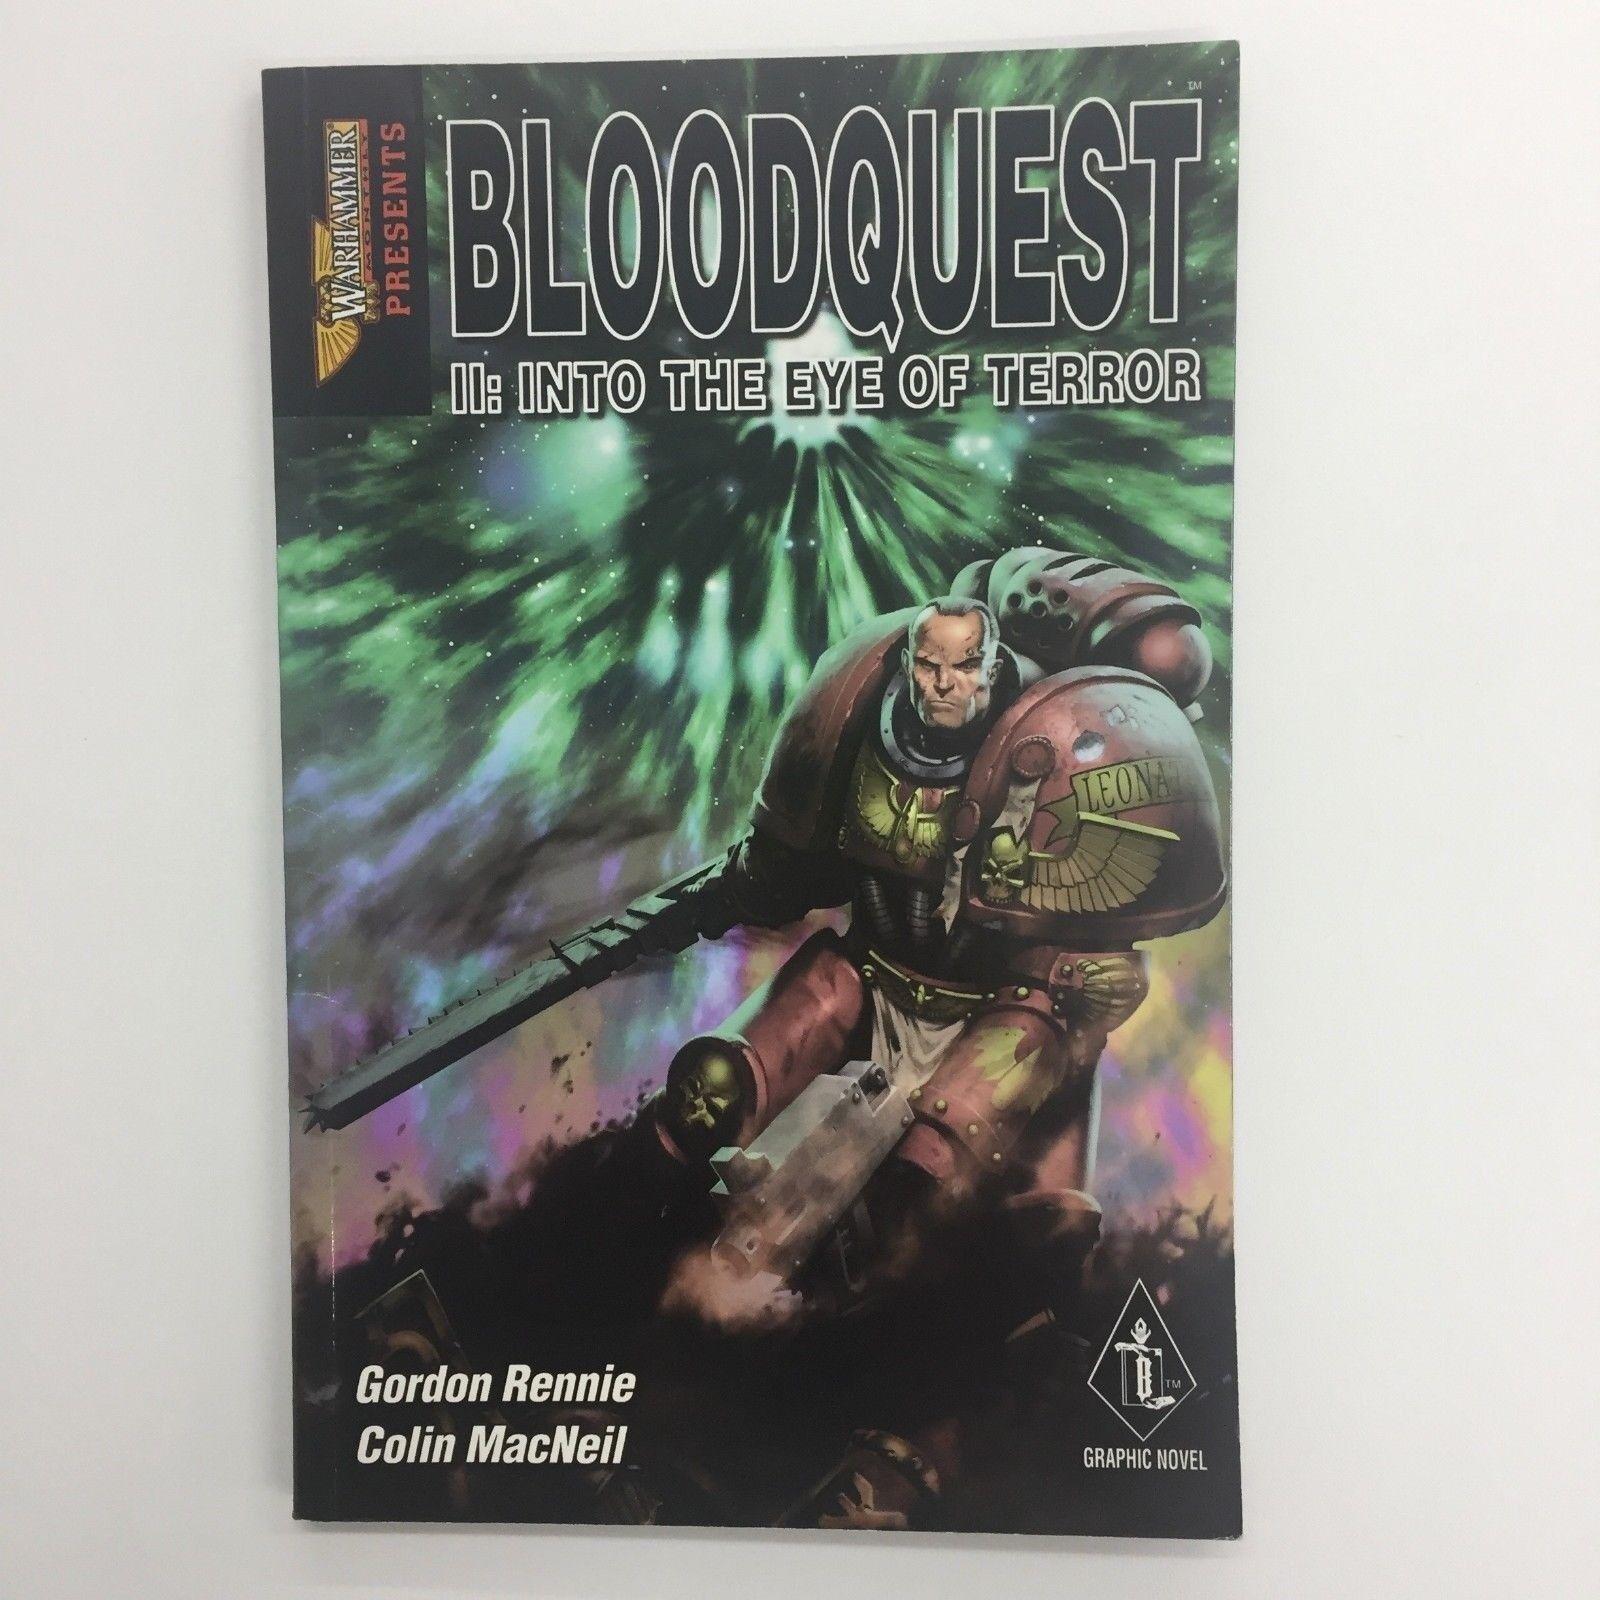 Warhammer Mensual Bloodquest II Into The Troll Ojo de Terror Graphic Novel 40K